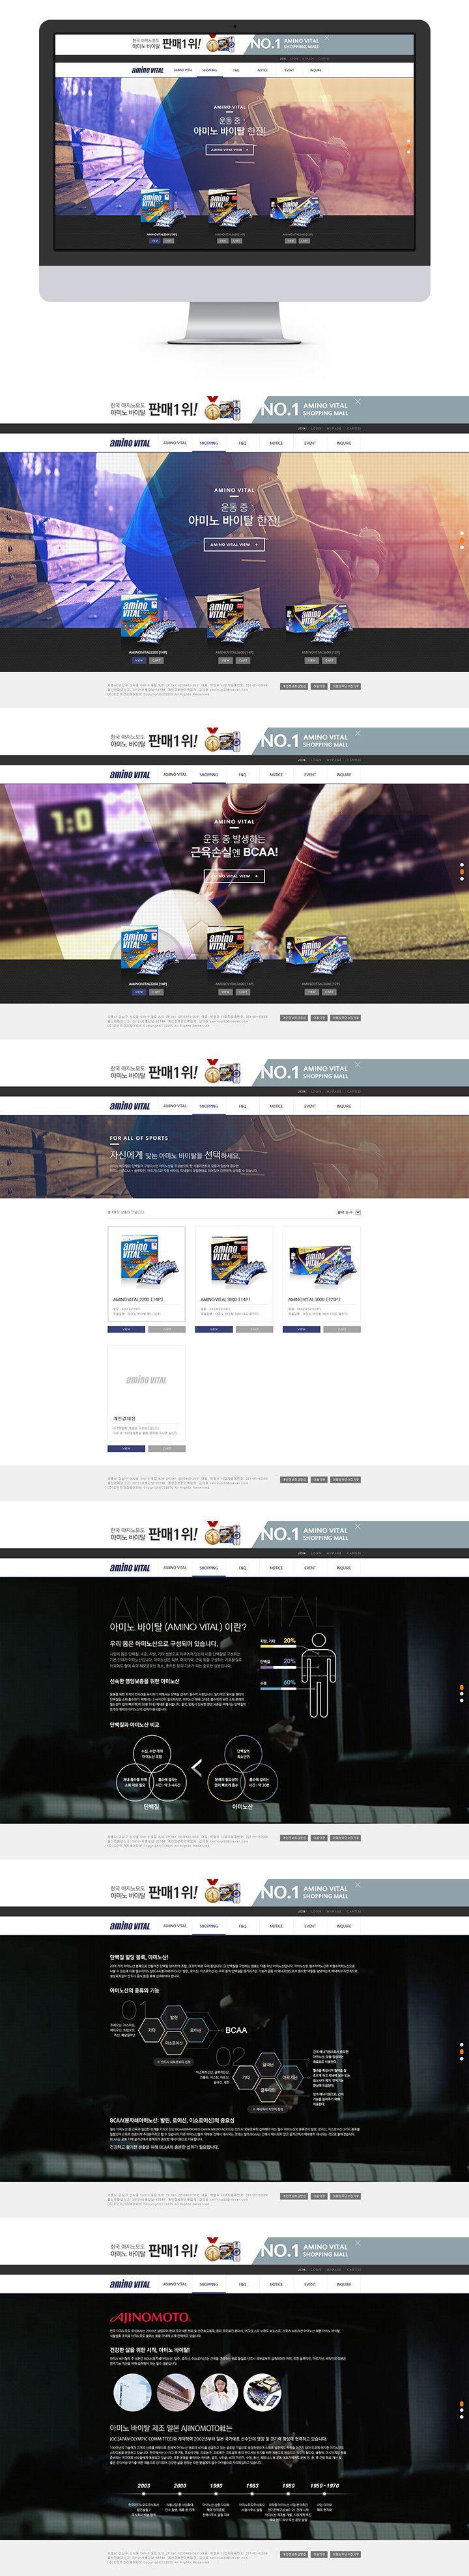 ZN (woman) Website - UI/UX